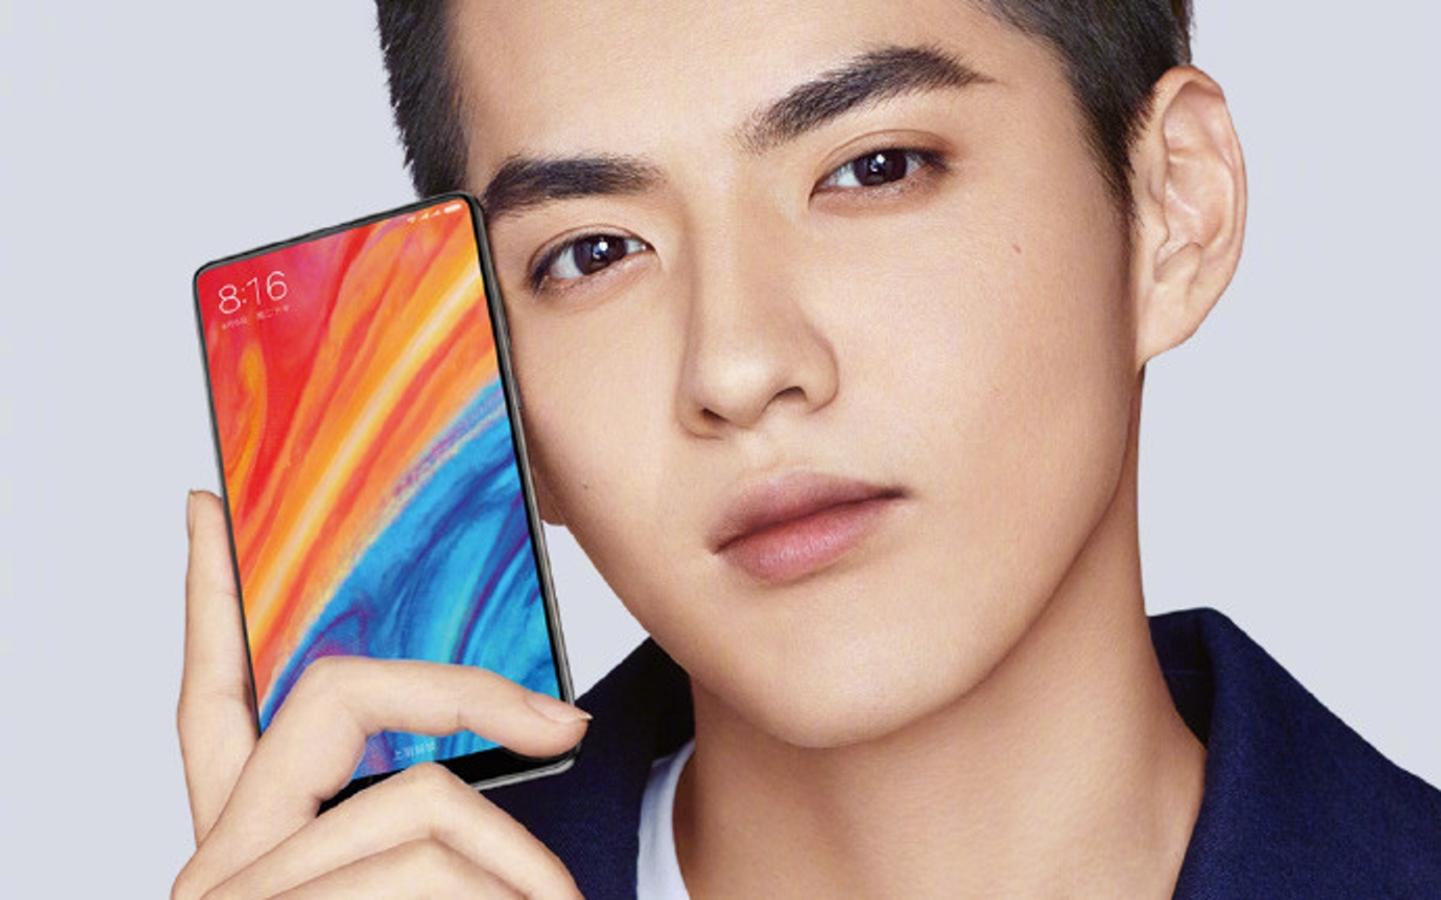 Xiaomi Mi Mix 2s tasarımı